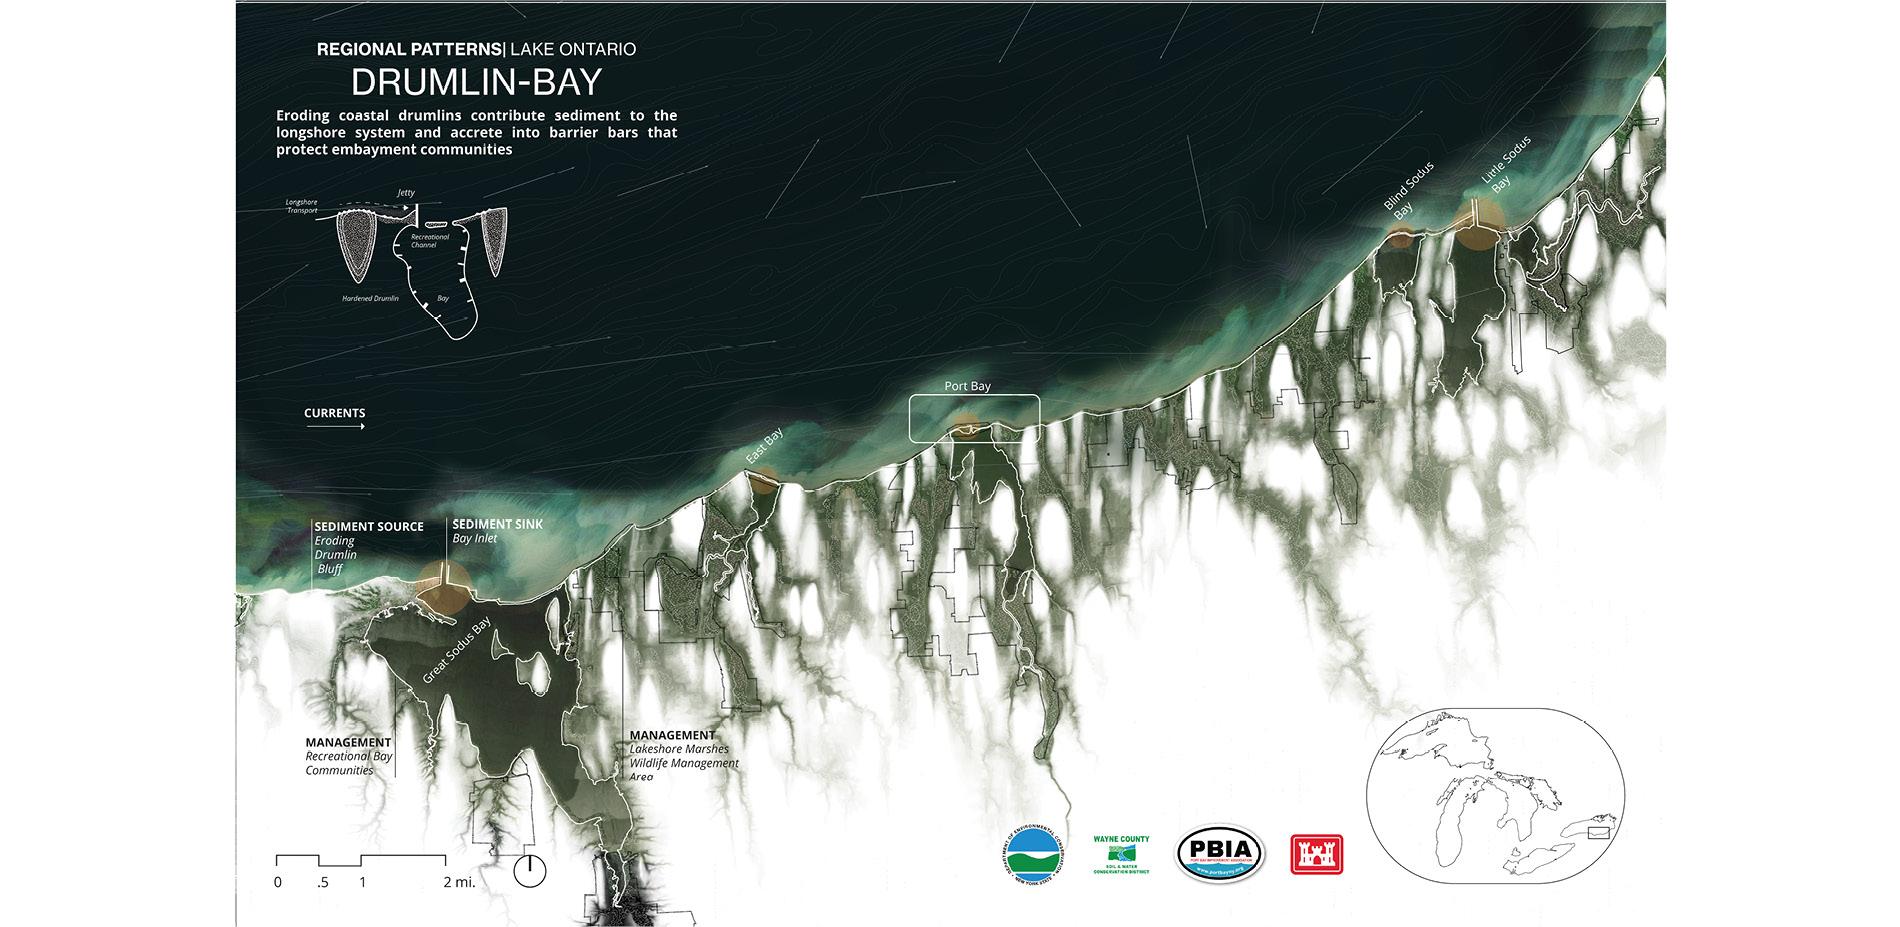 Drumlin Bay Complex: Regional Patterns